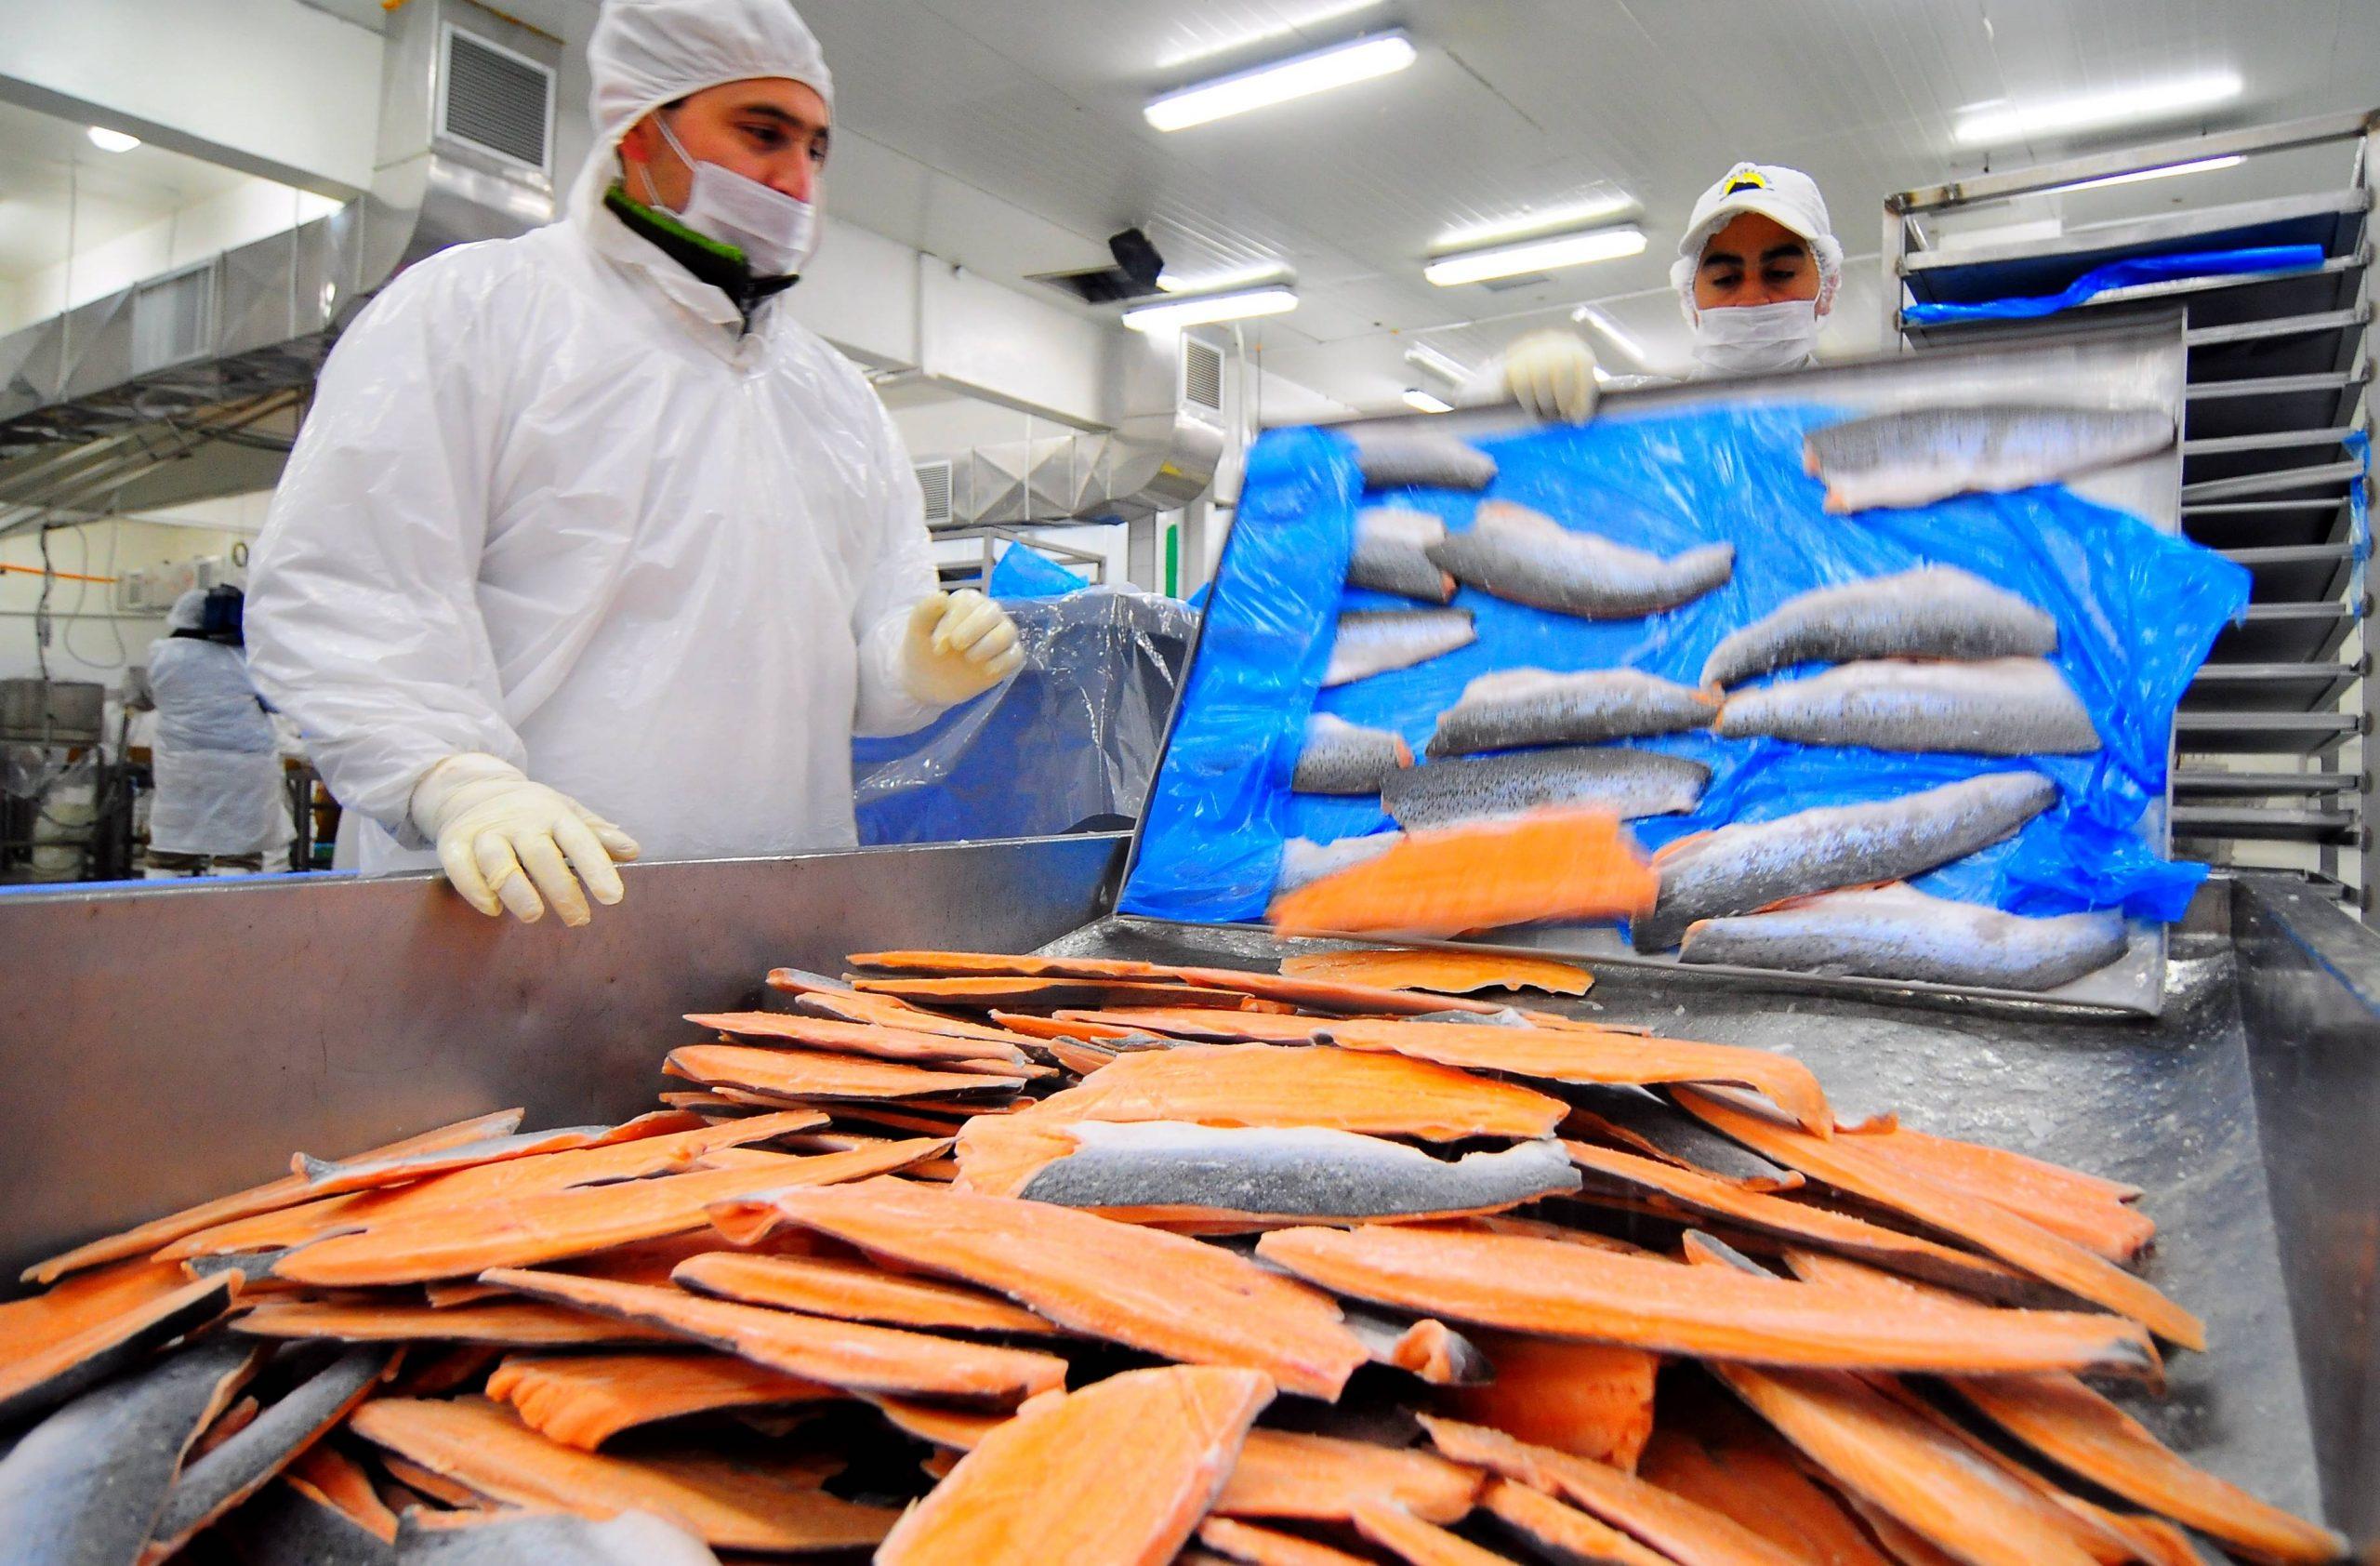 Desde 2019 Rusia ha bloqueado acceso a salmones chilenos tras detectar sustancias cancerígenas